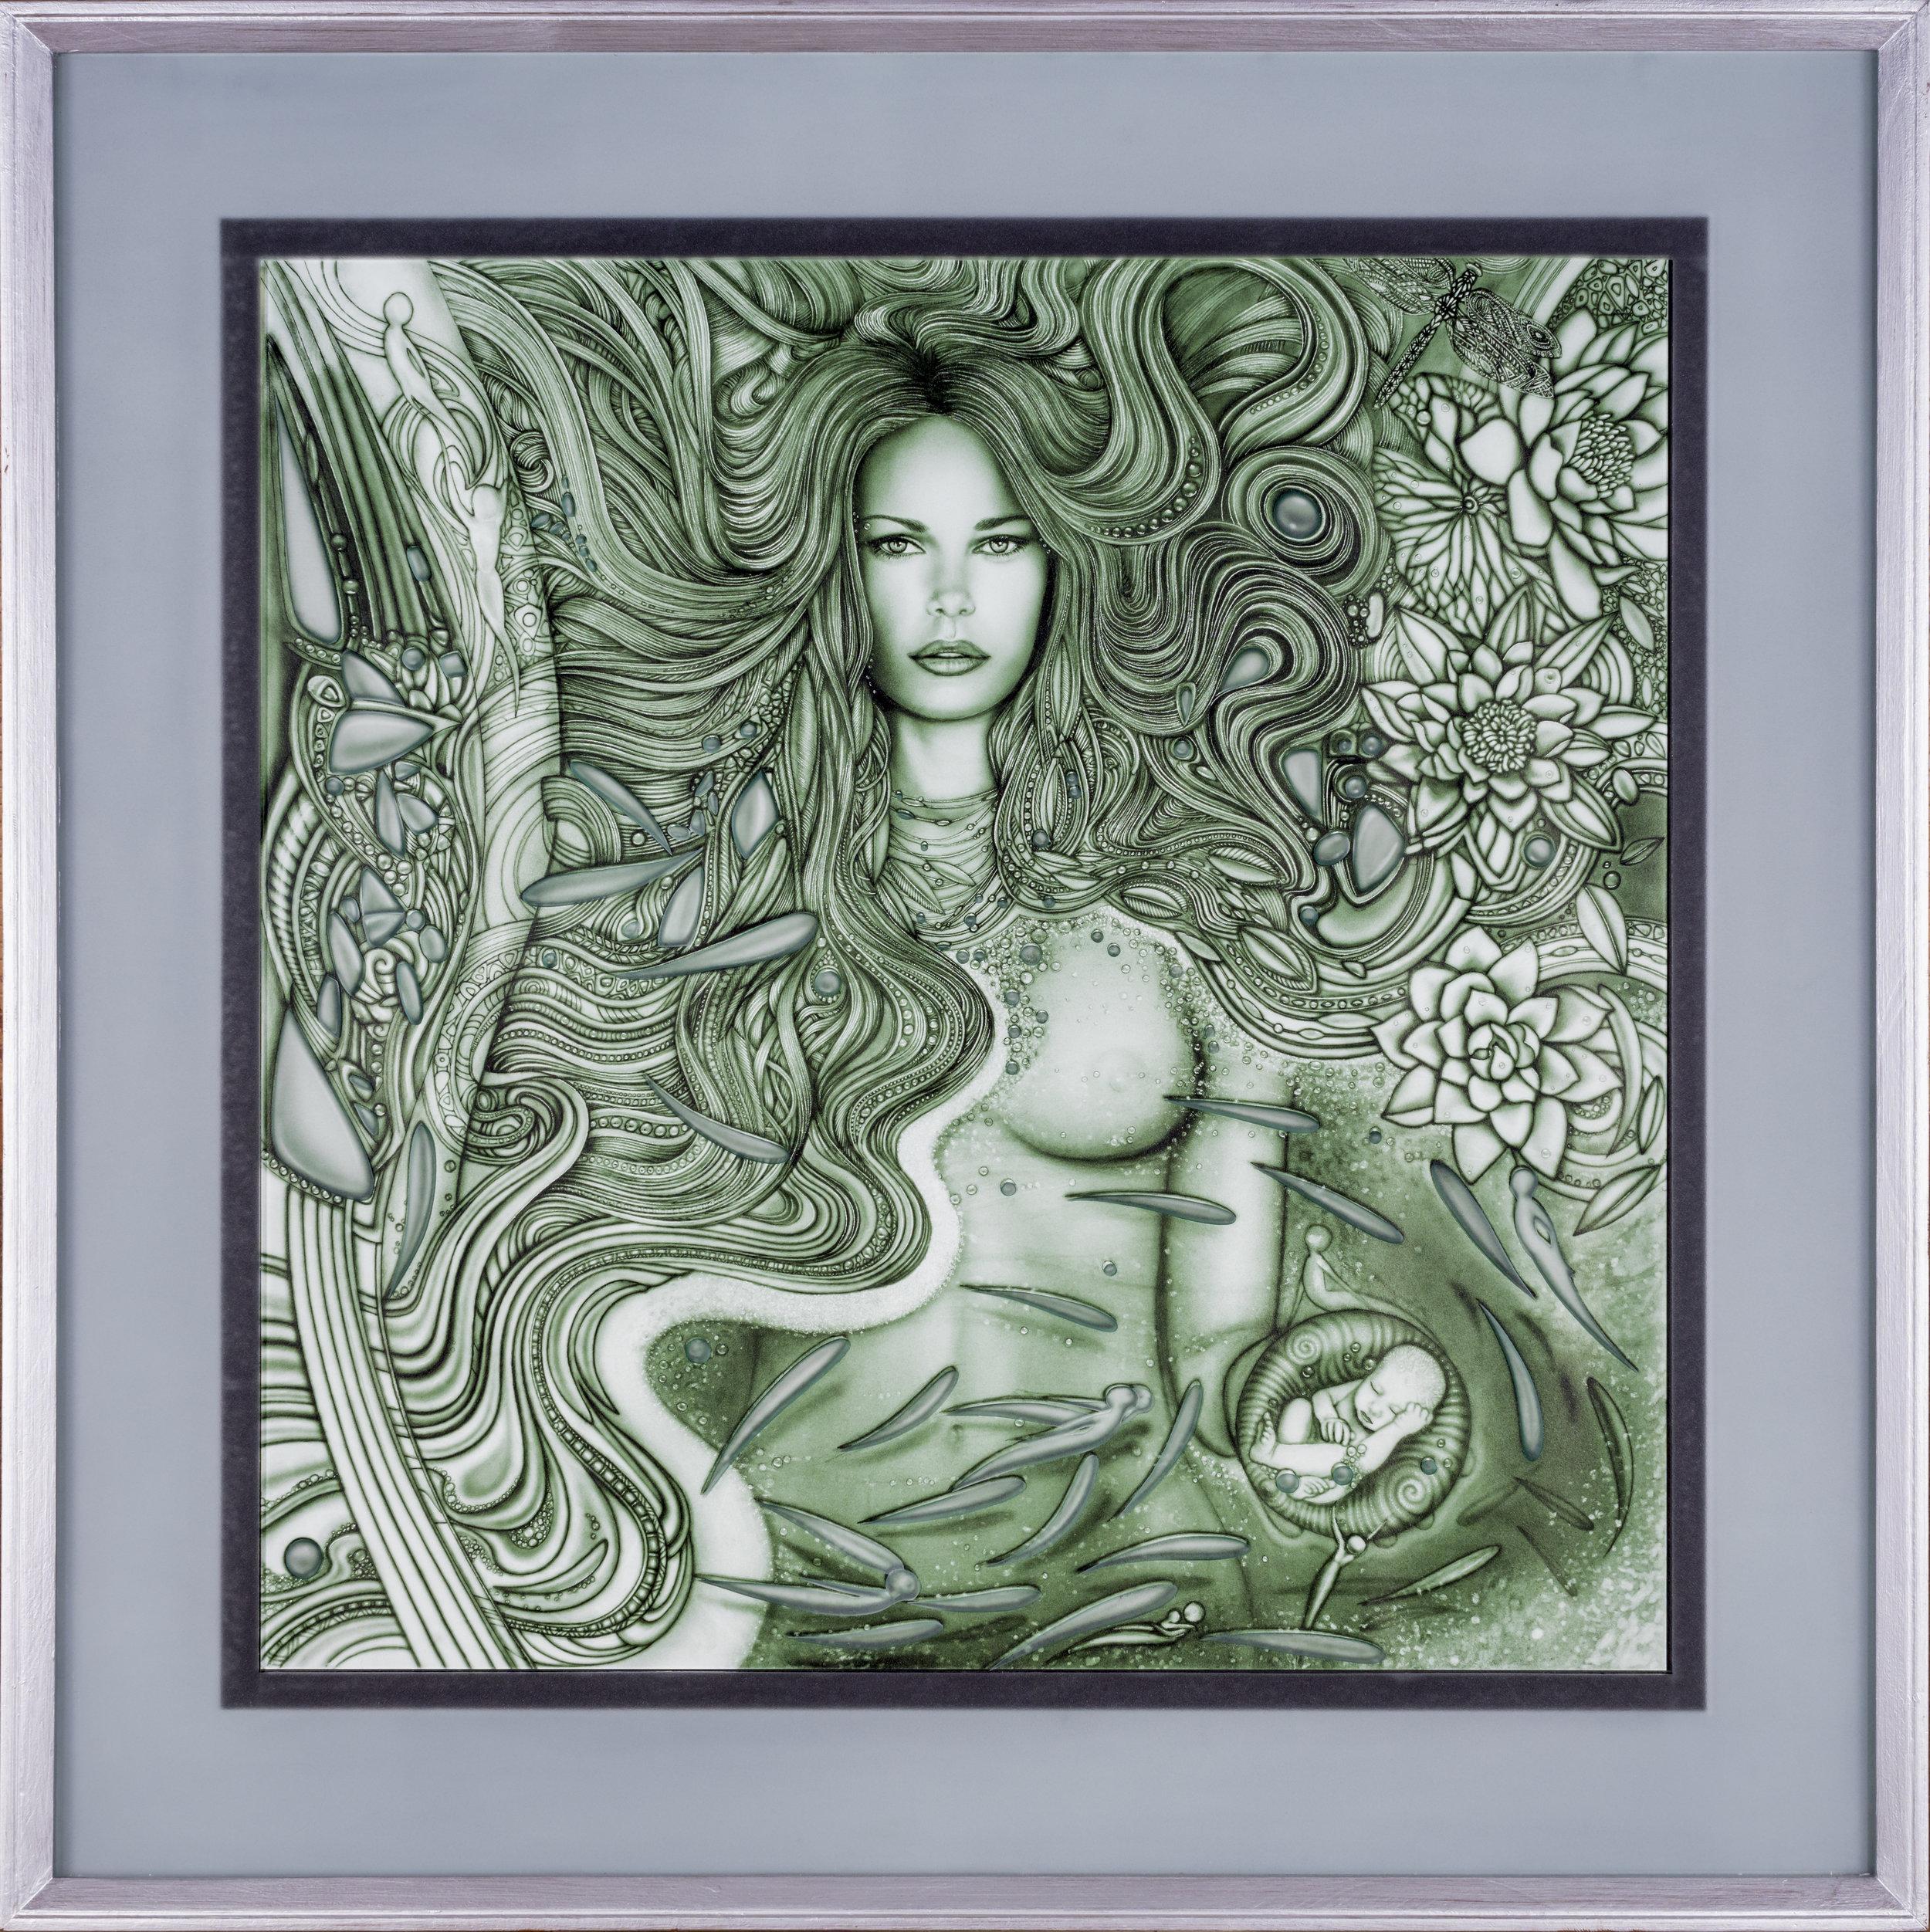 Rhiannon - Dimensions: 48